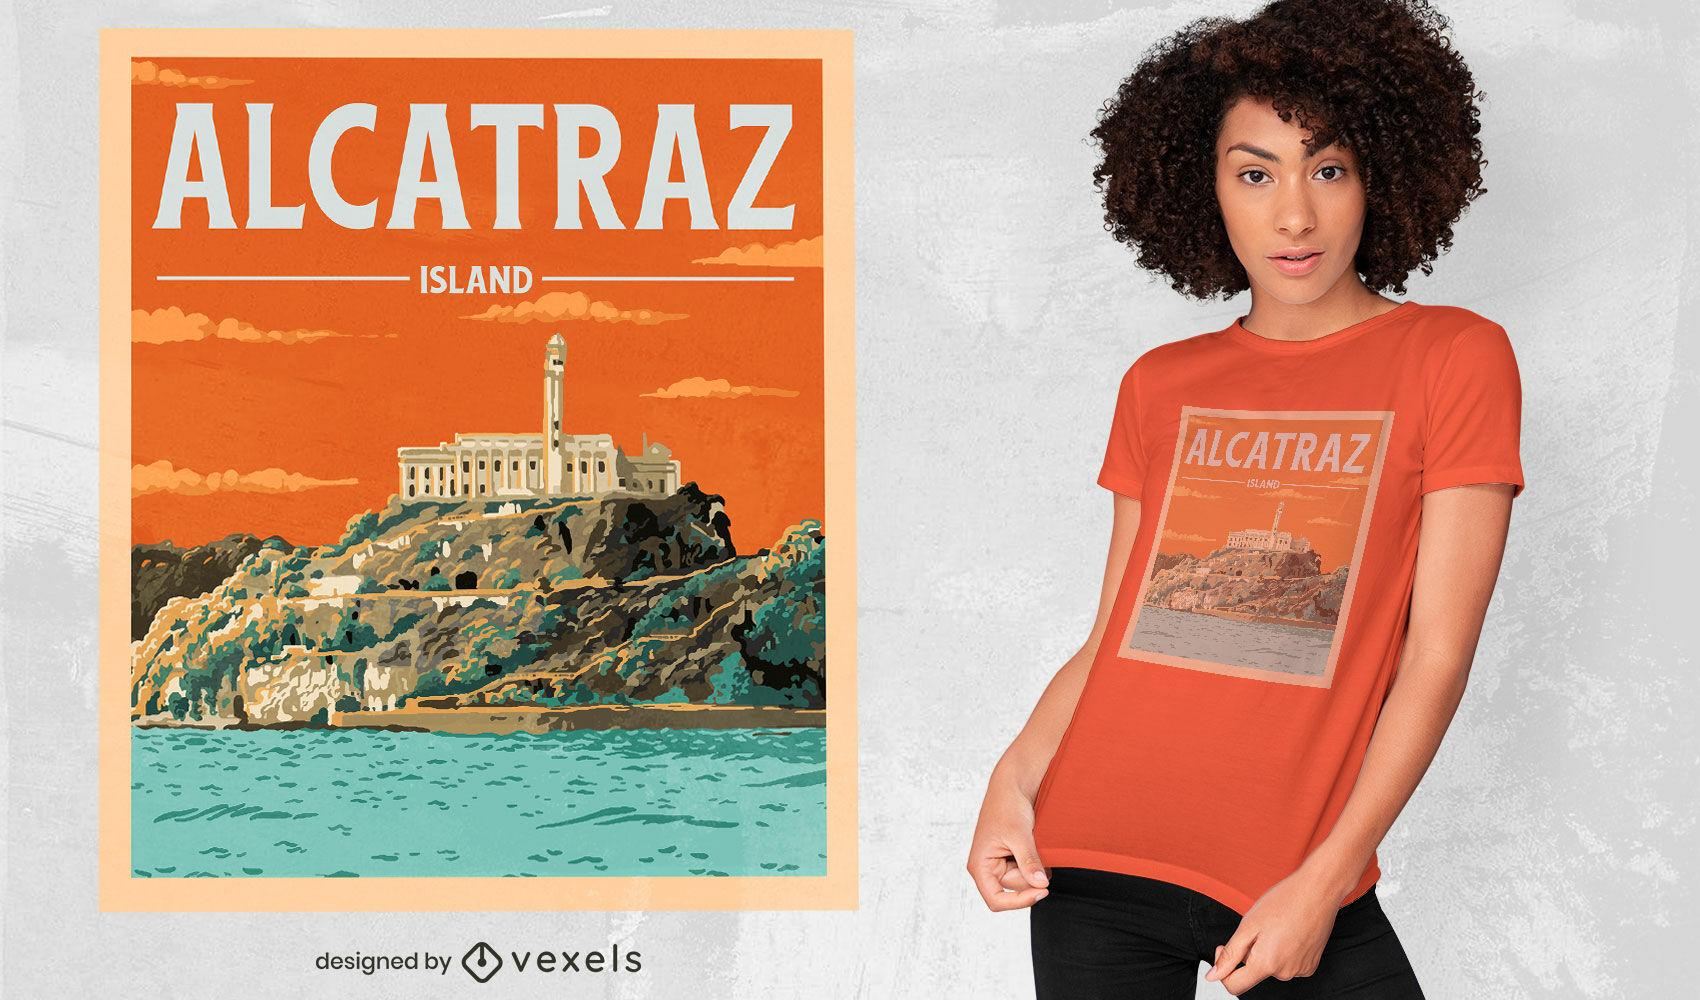 Alcatraz Gefängnisreise Poster T-Shirt Design